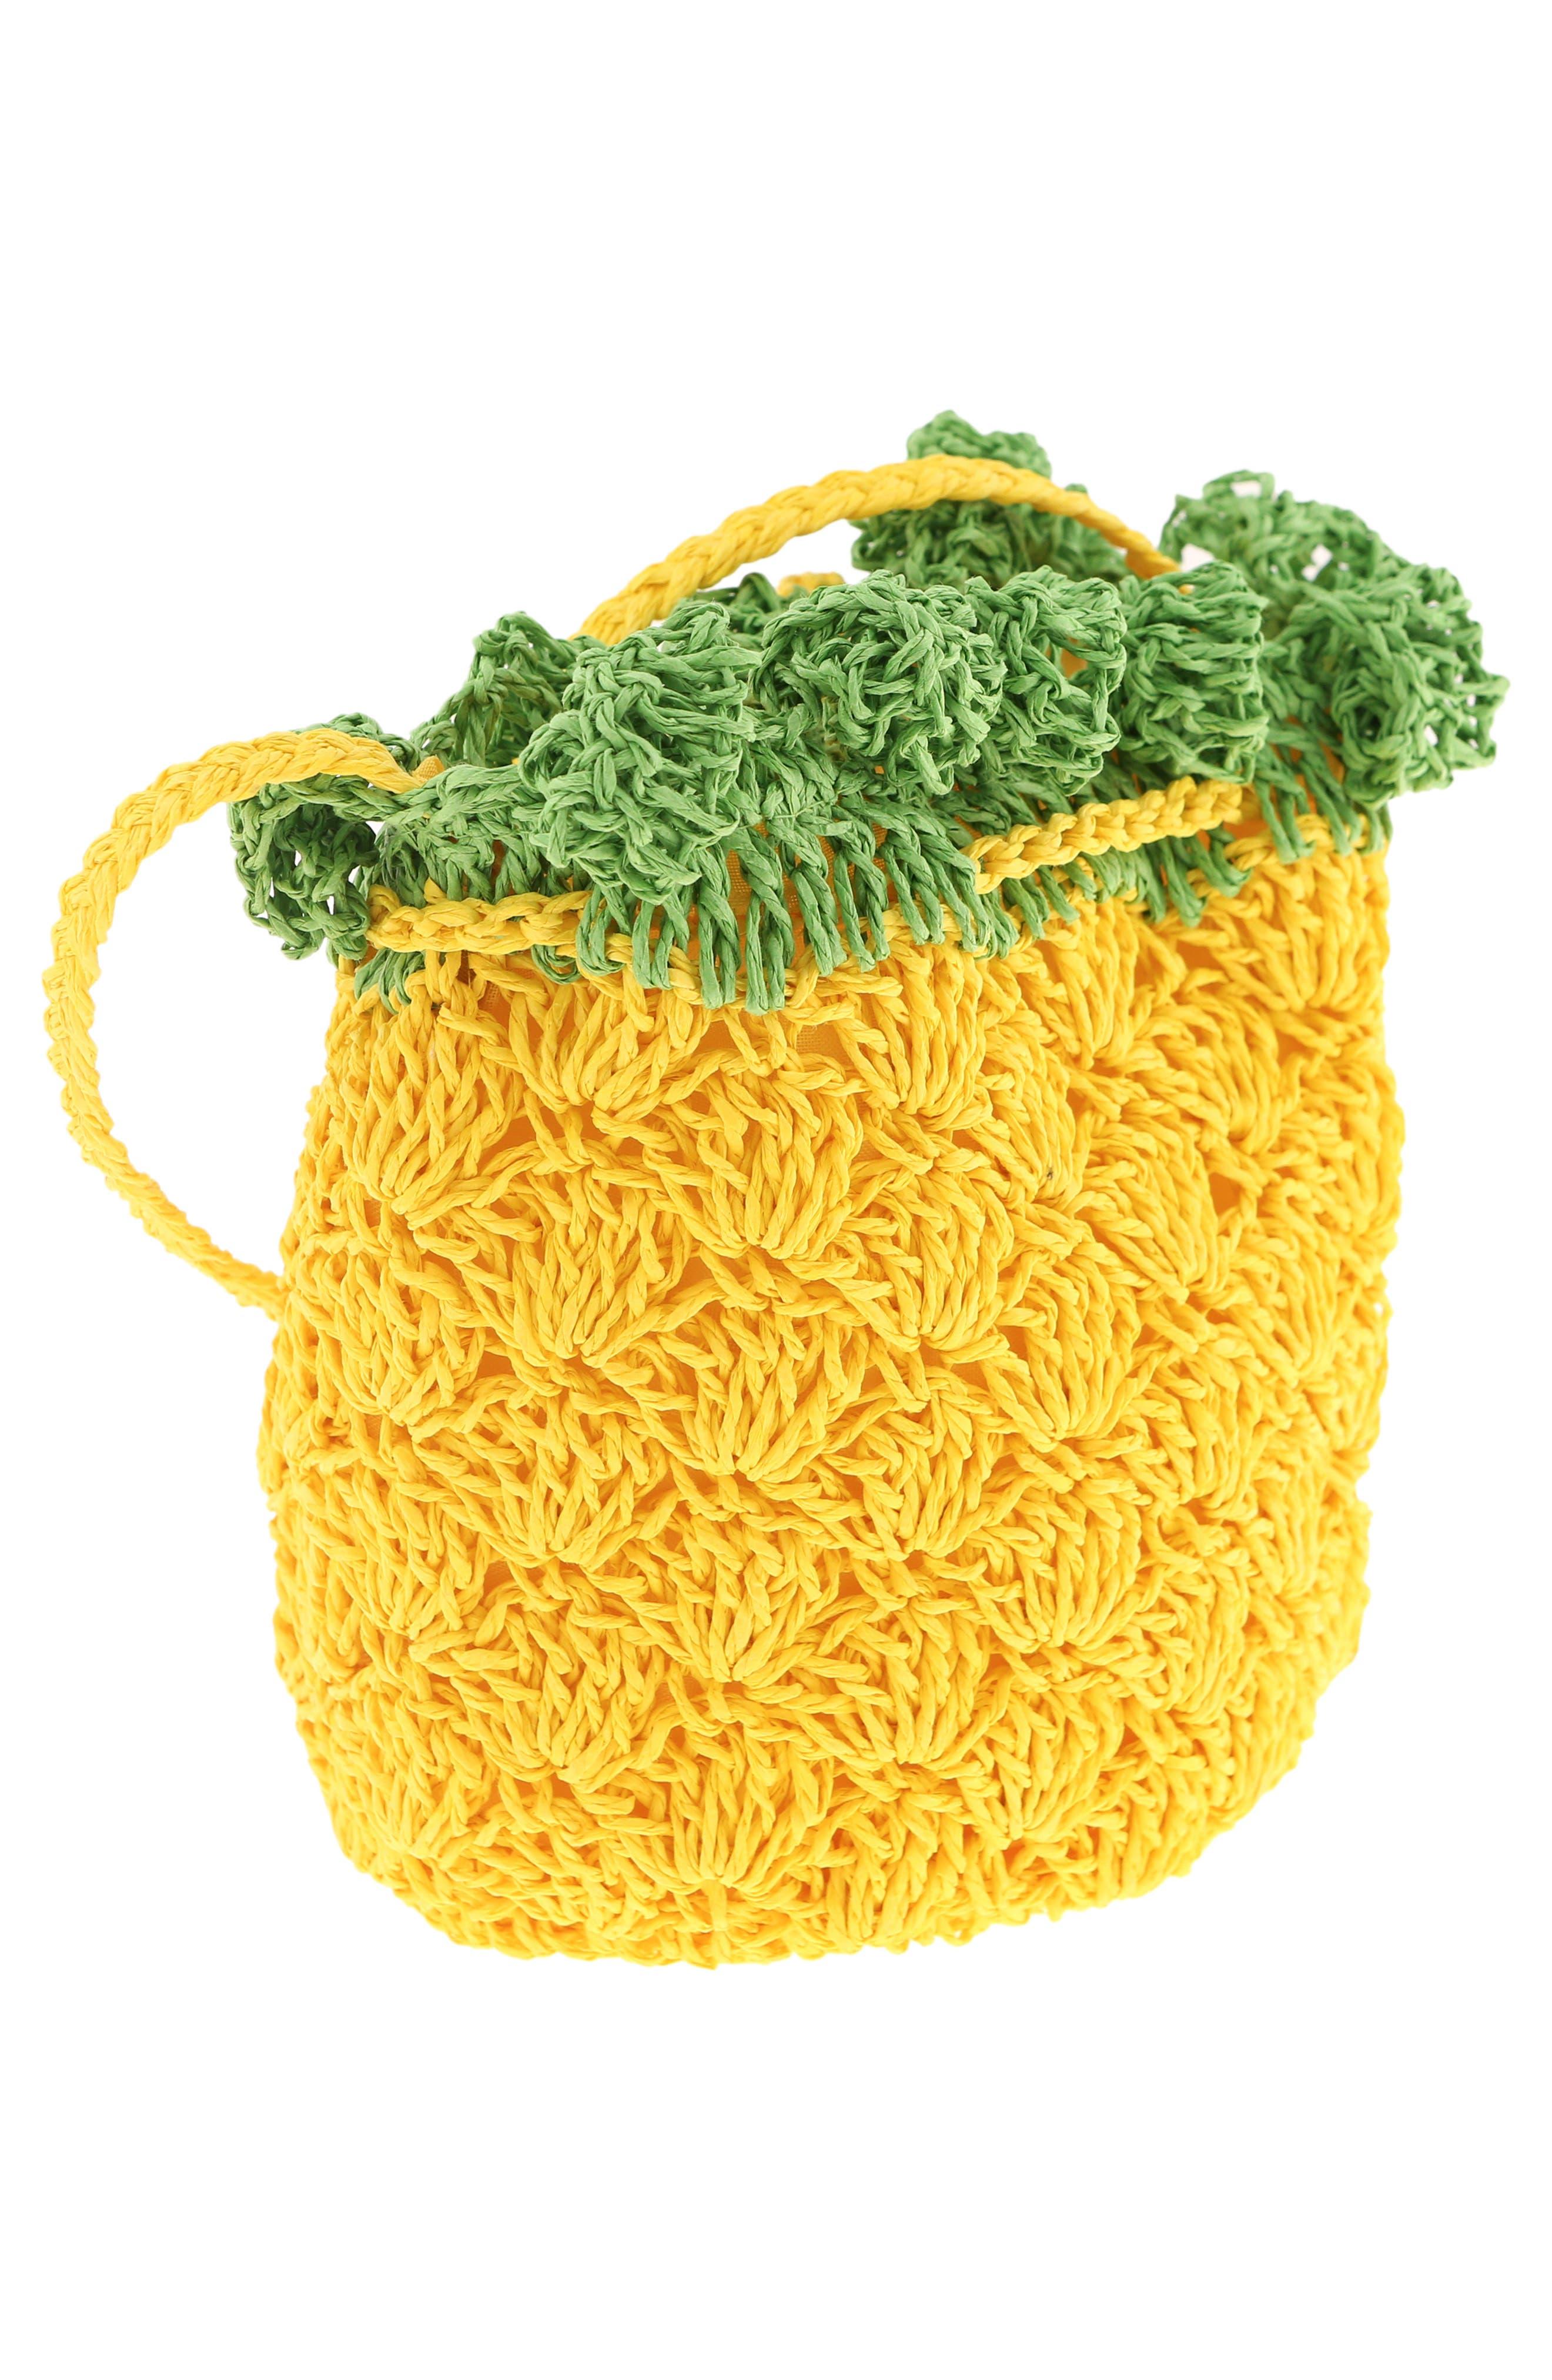 Crochet Pineapple Crossbody Bag,                             Alternate thumbnail 2, color,                             YELLOW COMBO